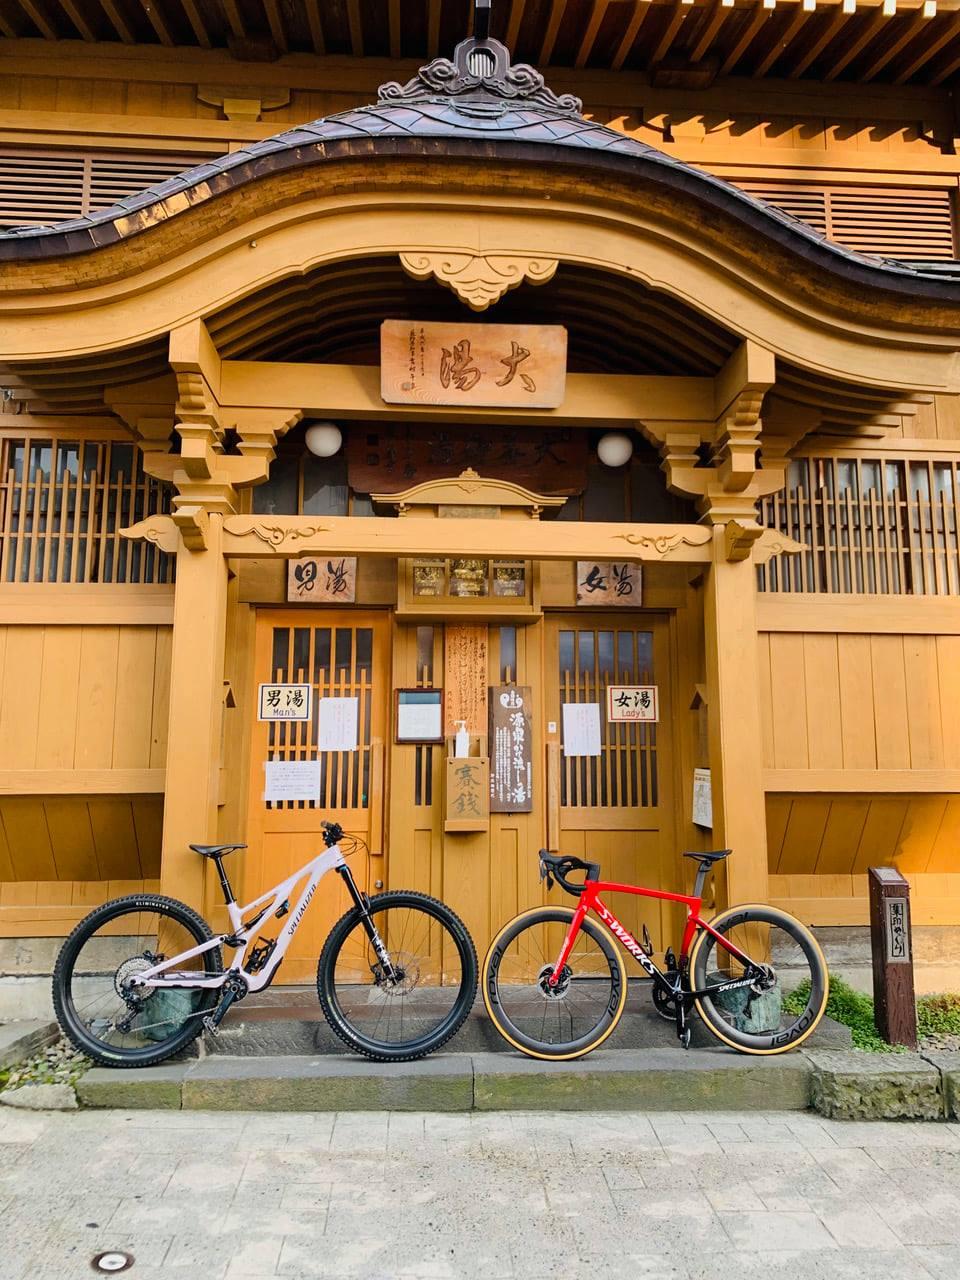 Nozawa Onsen Bike Festival